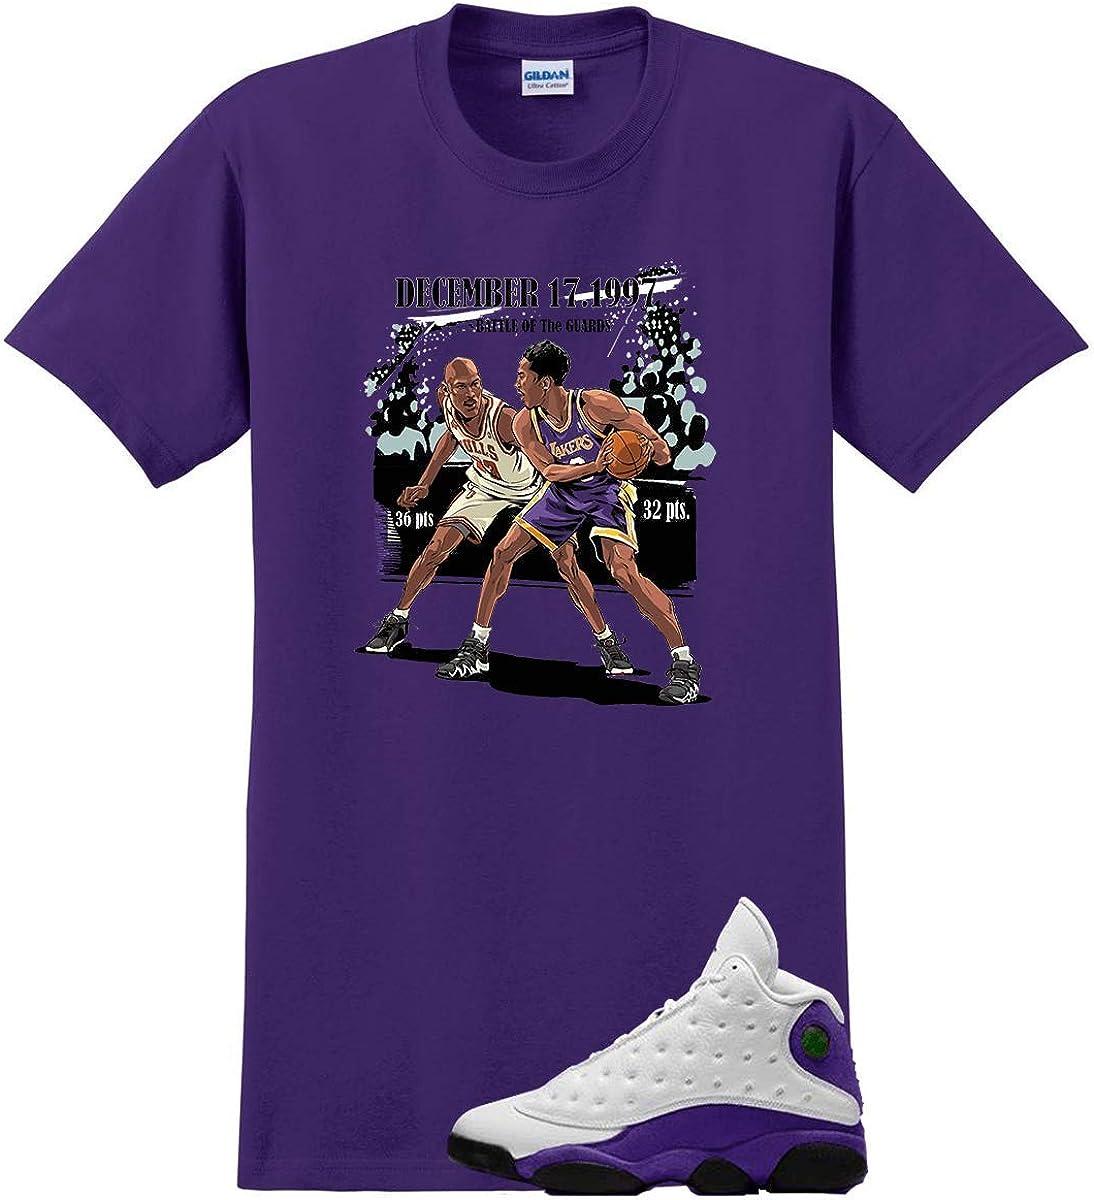 Shirt for Jordan 13 Lakers Laker Purple